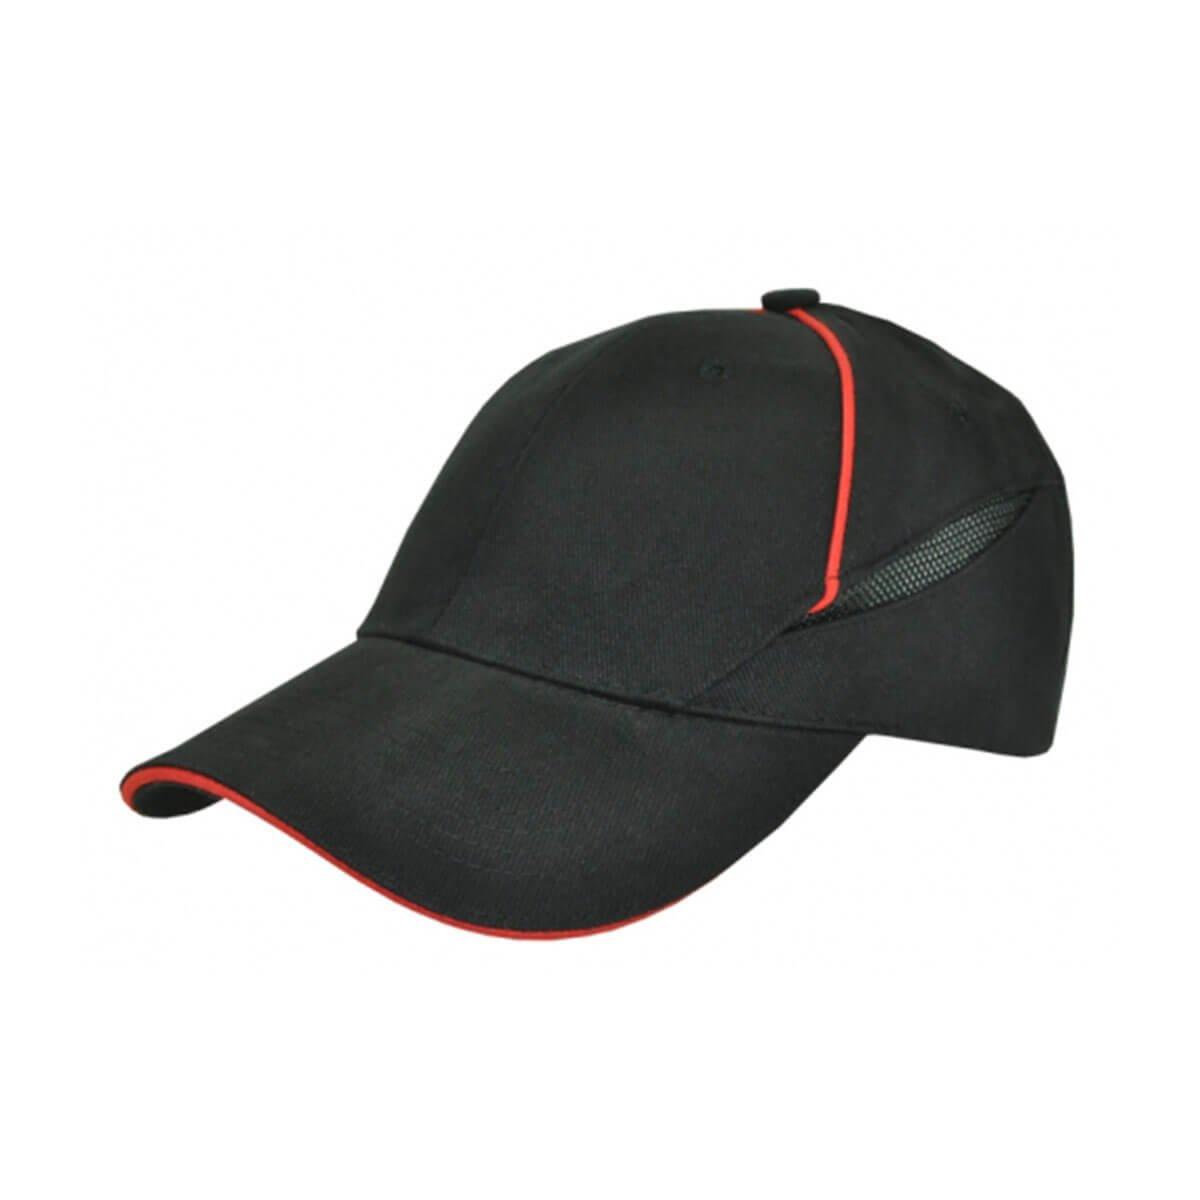 Hybrid Cap-Black / Red